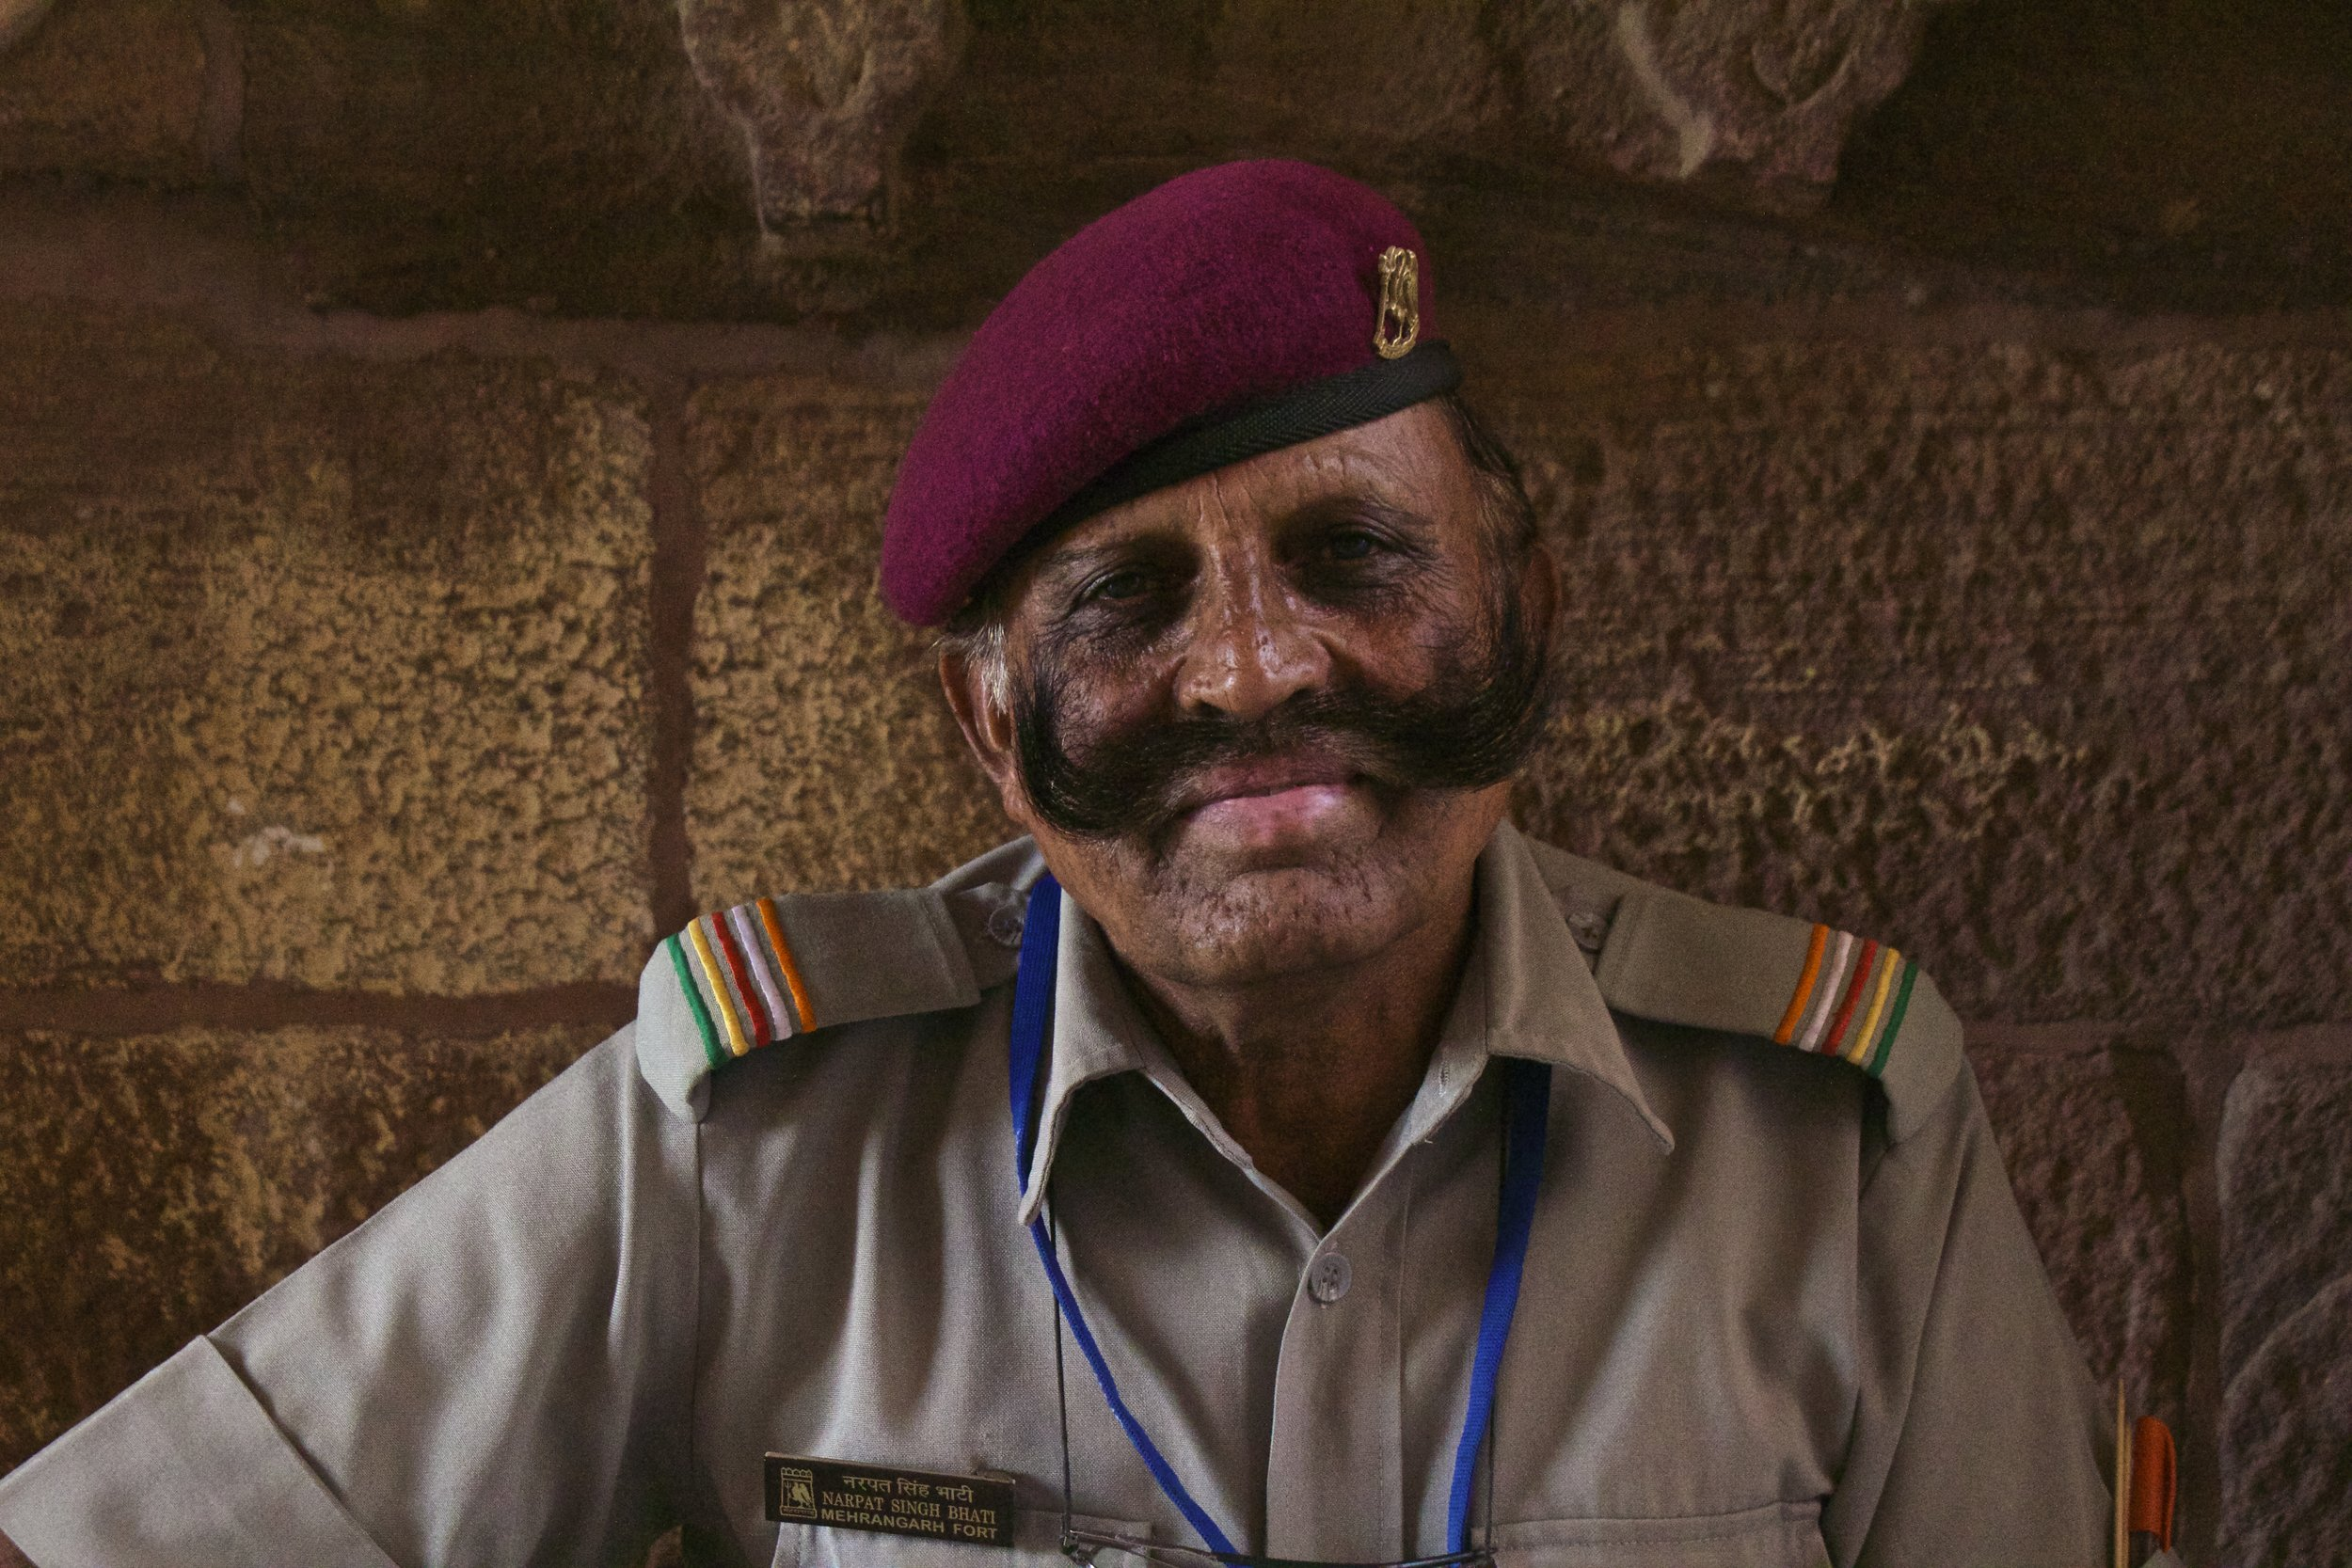 mehrangarh fort jodhpur rajasthan india 22.jpg